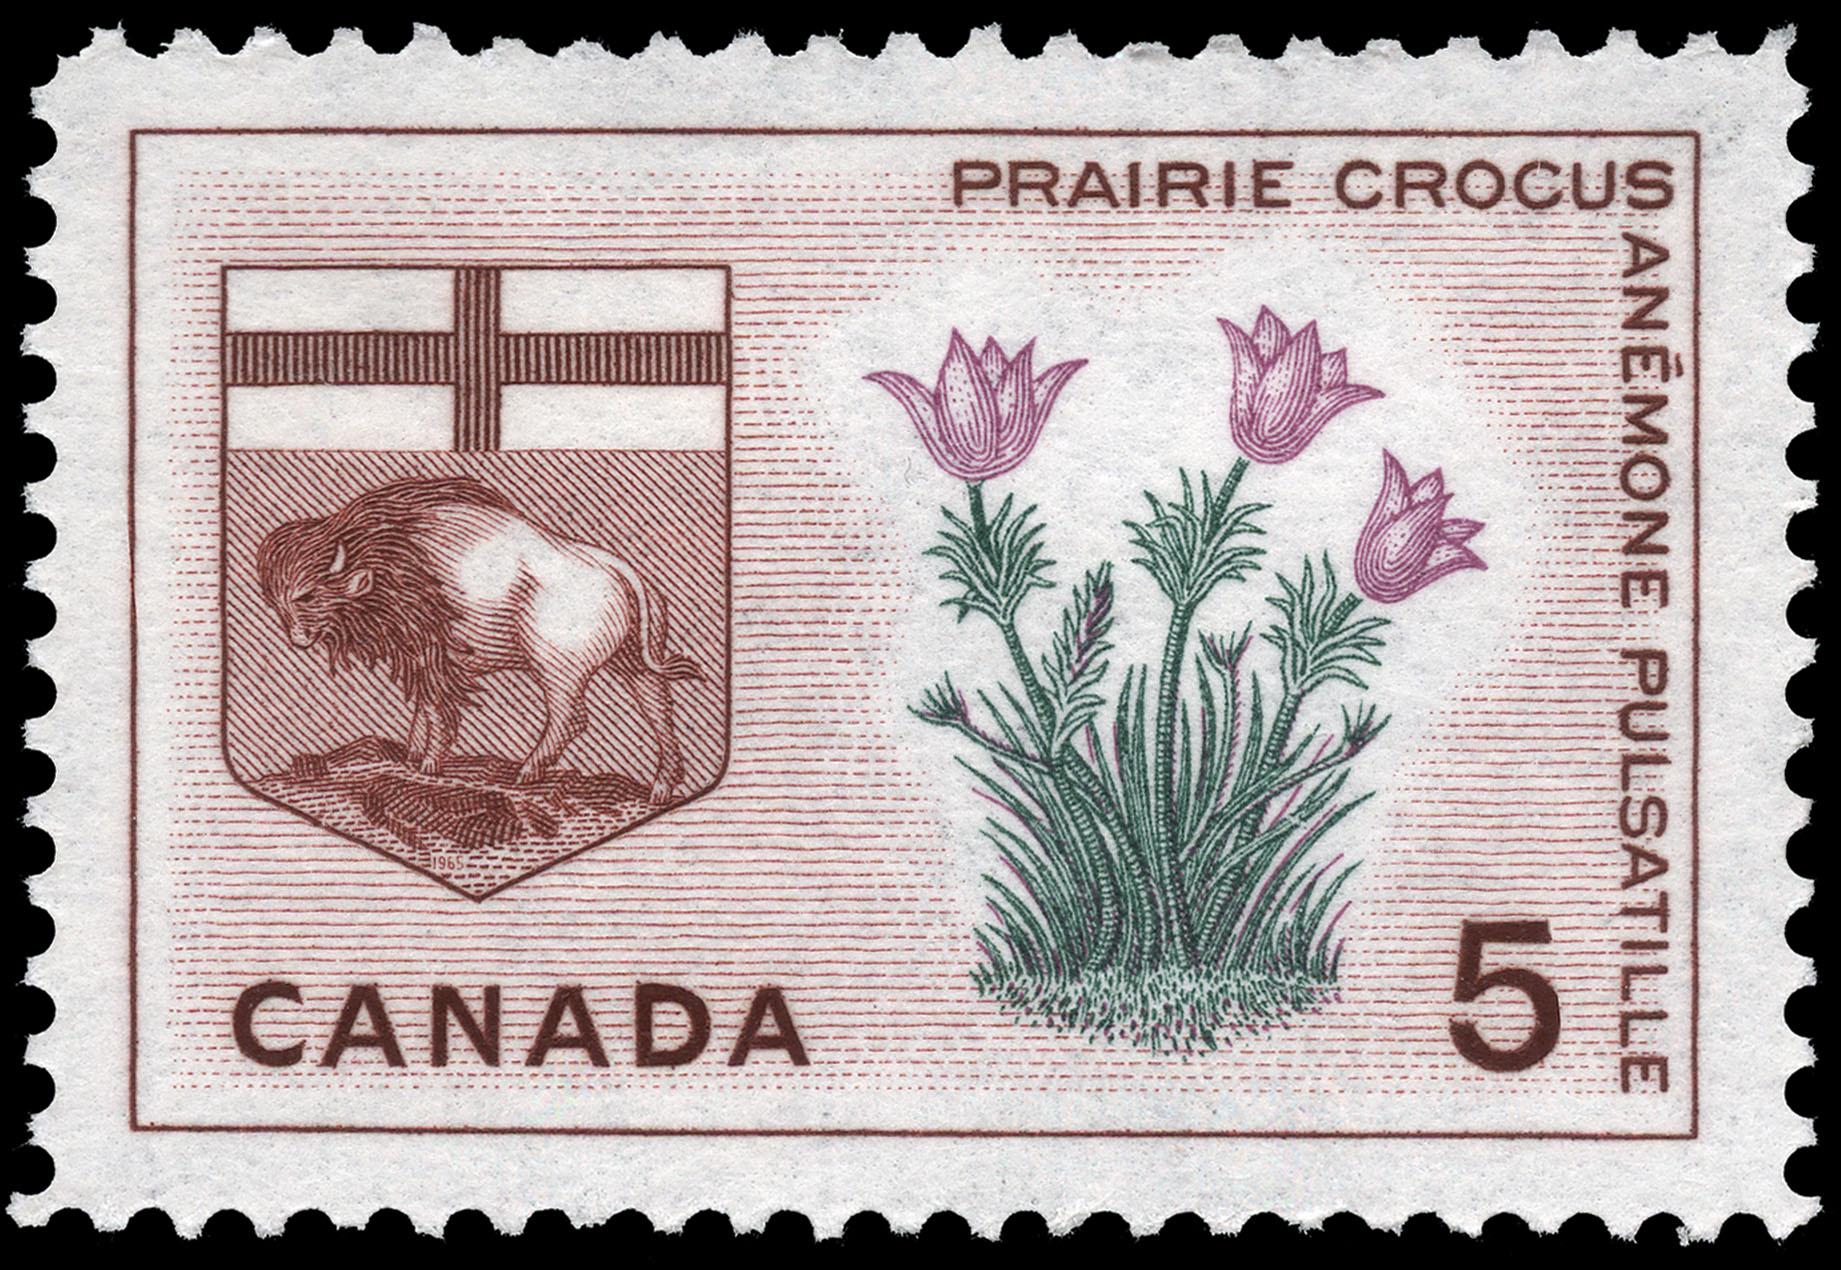 Prairie Crocus, Manitoba Canada Postage Stamp